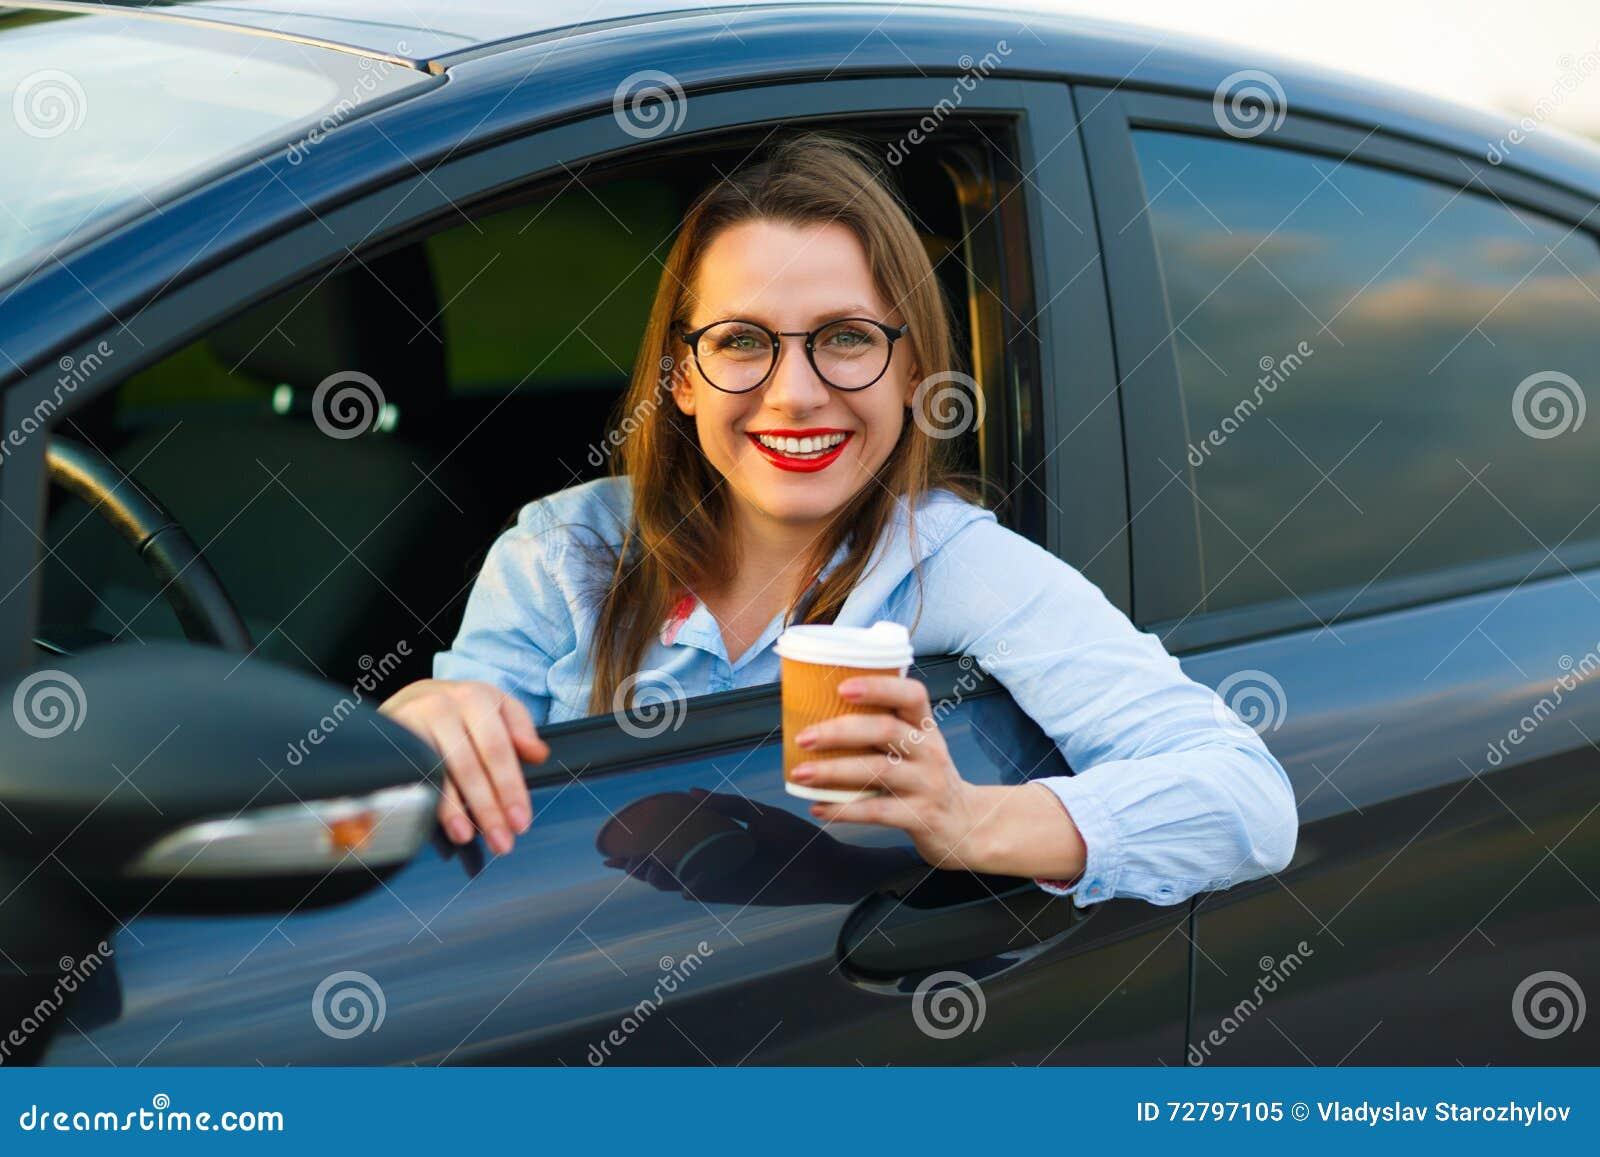 jeune femme avec du caf pour aller conduire sa voiture image stock image 72797105. Black Bedroom Furniture Sets. Home Design Ideas